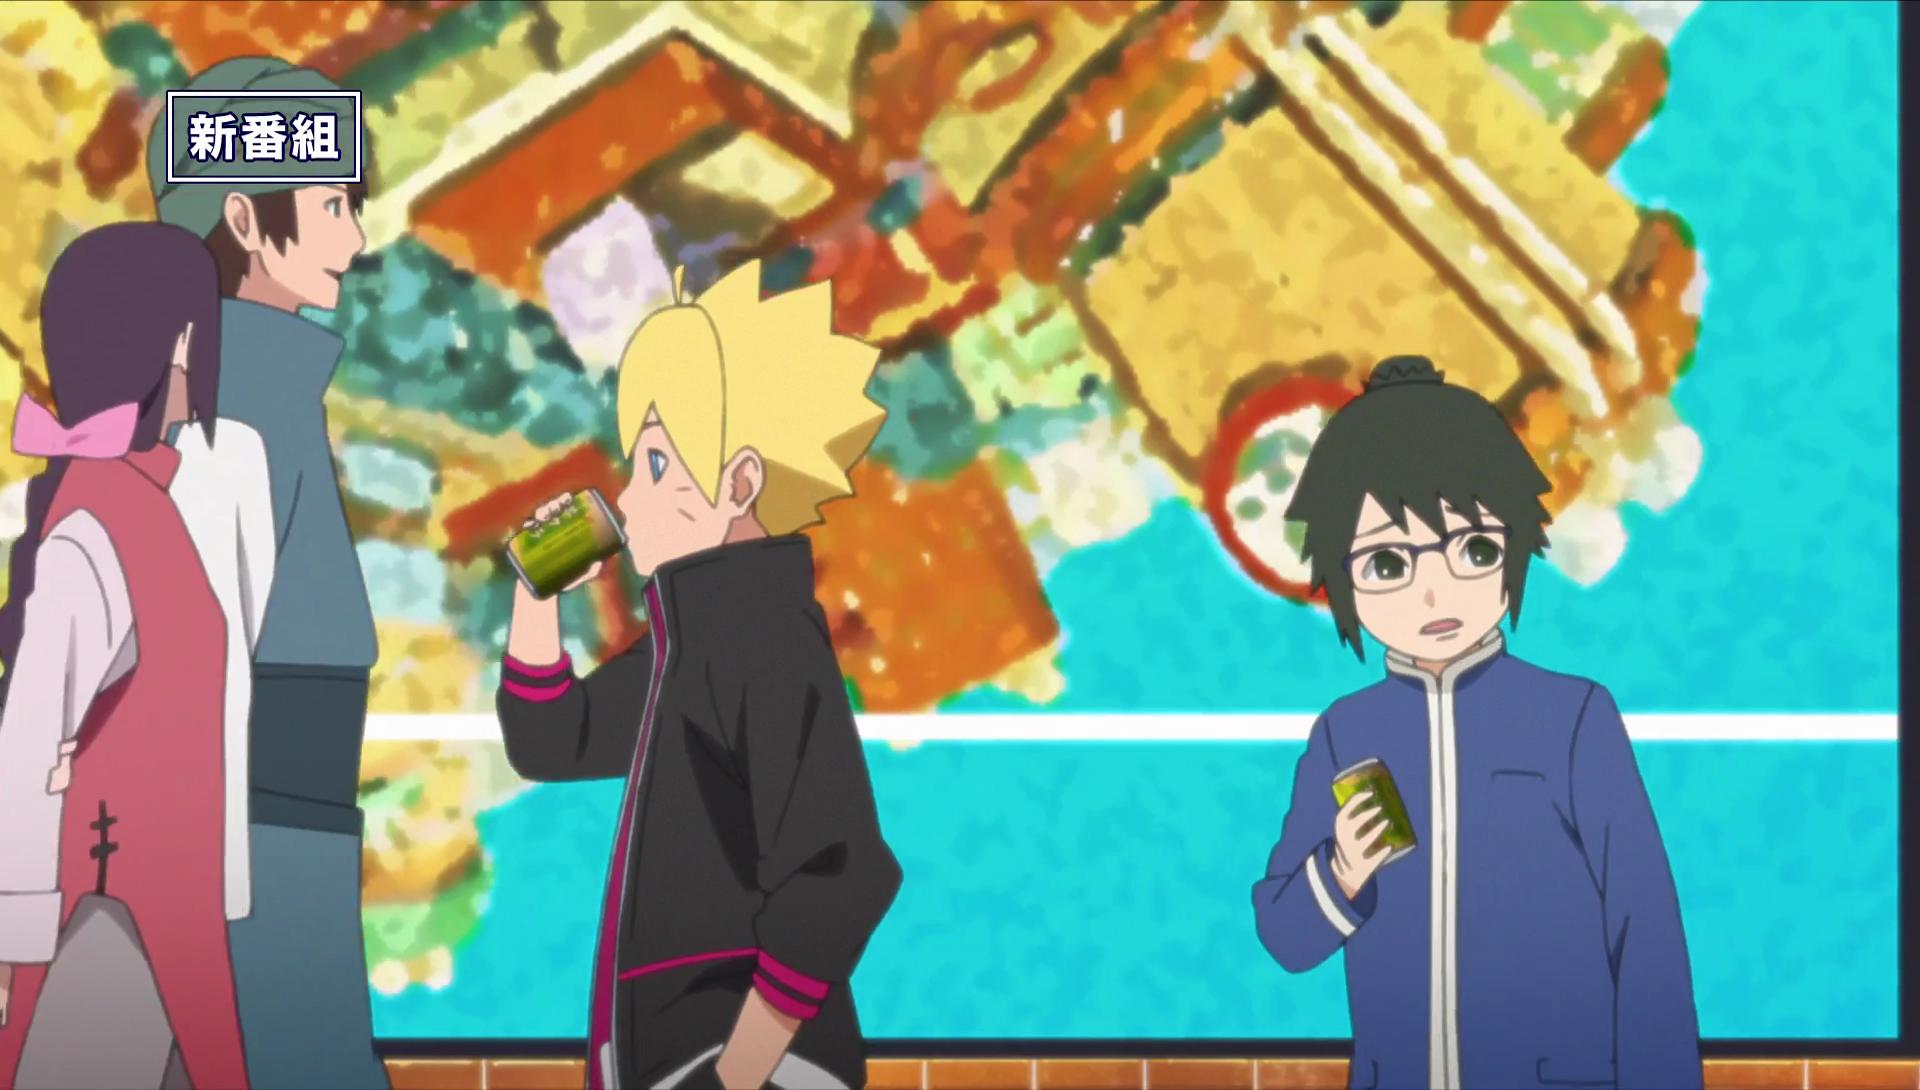 Boruto -Naruto Next Generations PV 2 - 11 by AiKawaiiChan